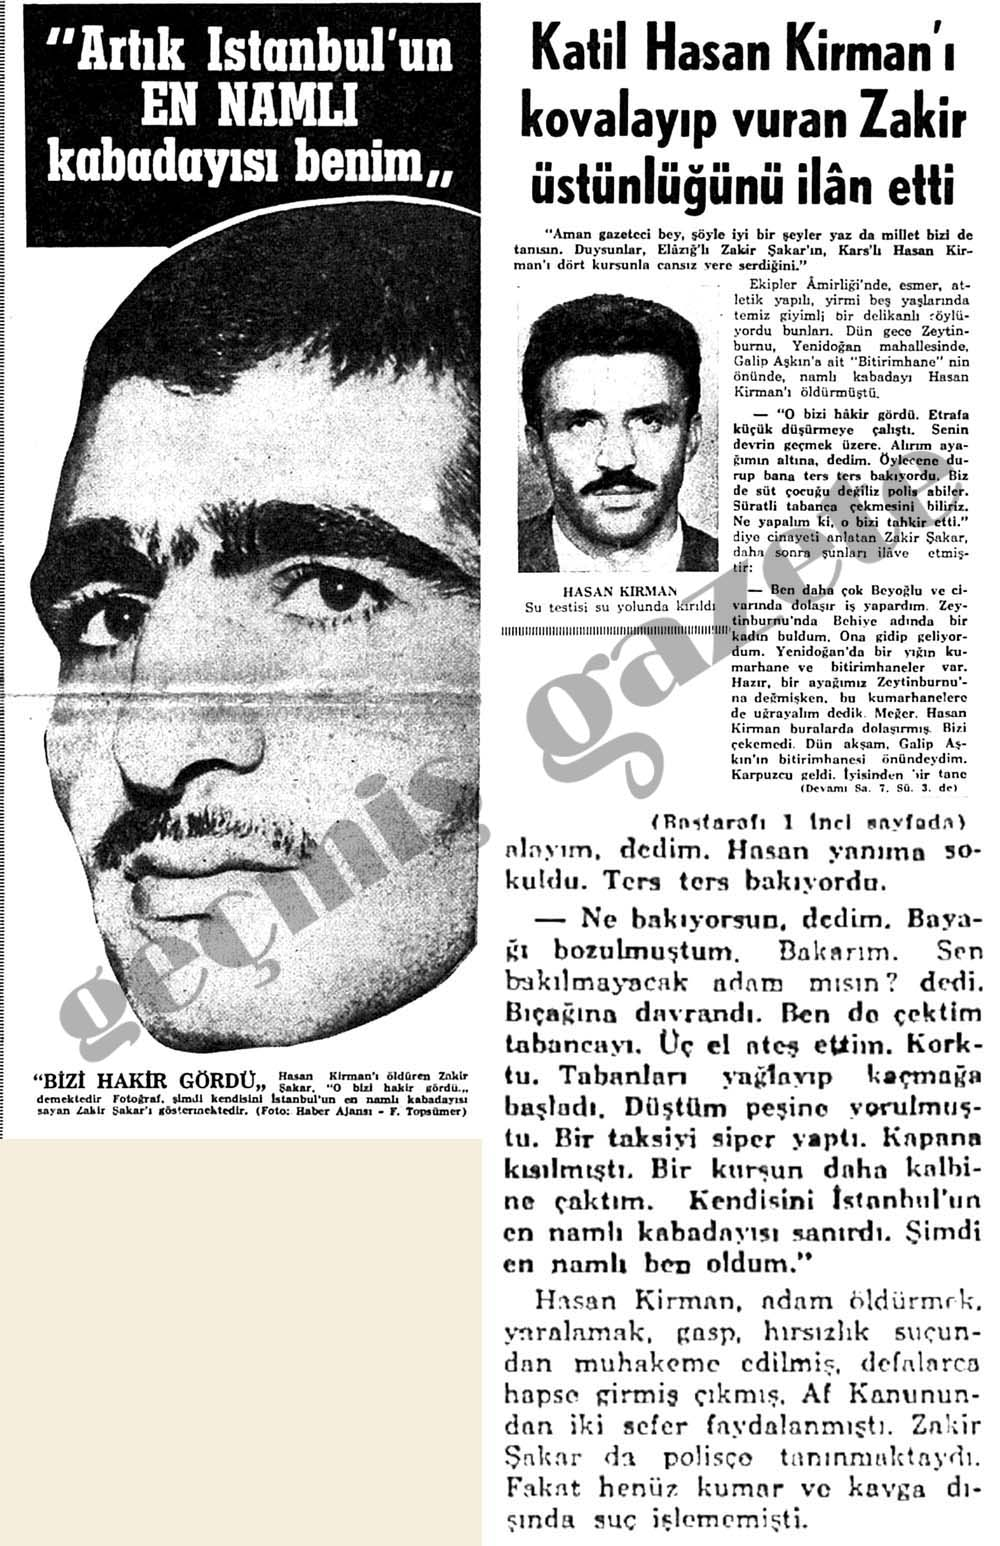 Katil Hasan Kirman'ı kovalayıp vuran Zakir üstünlüğünü ilan etti